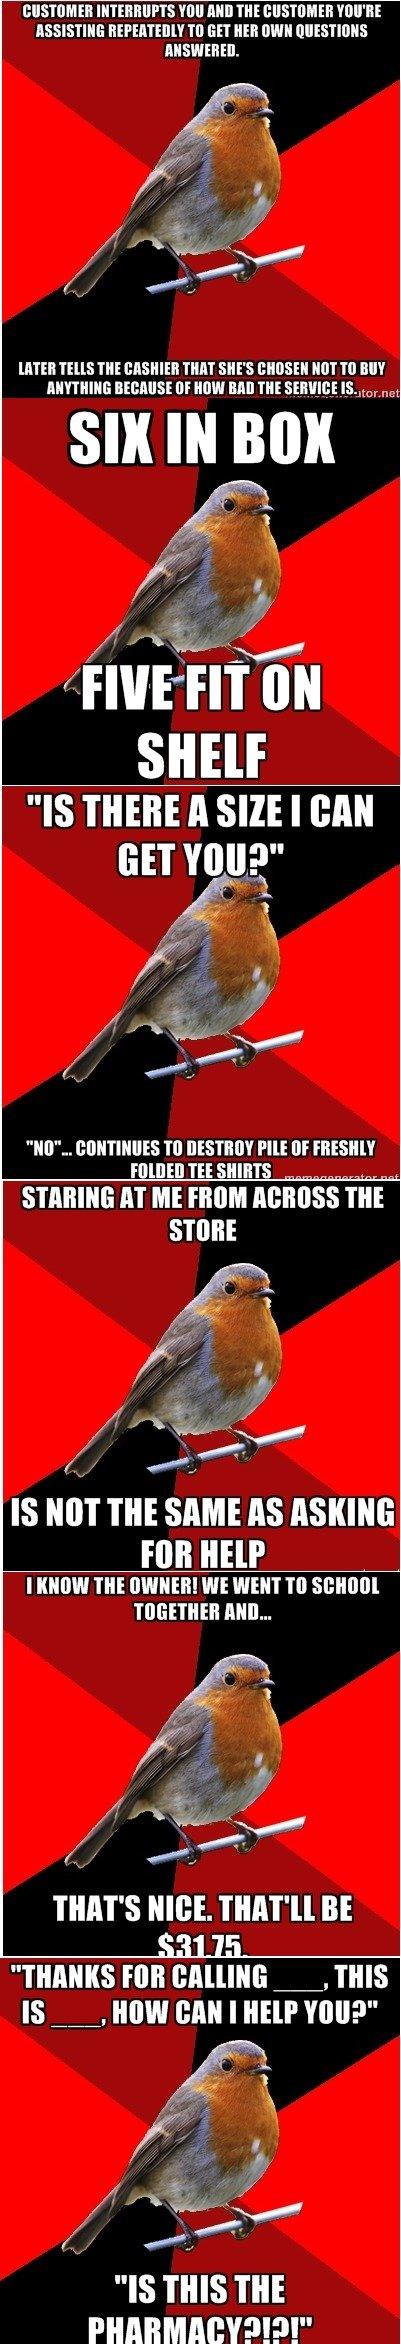 "Retail Robin comp, pt 2. Here's the first one: /funny_pictures/3912163/Retail+Robin+Comp+pt1/. INN AHI] m I' VIII' HE IIEK' "" TI] EH NEH WIN BITTEH nus m nun an retail robin"